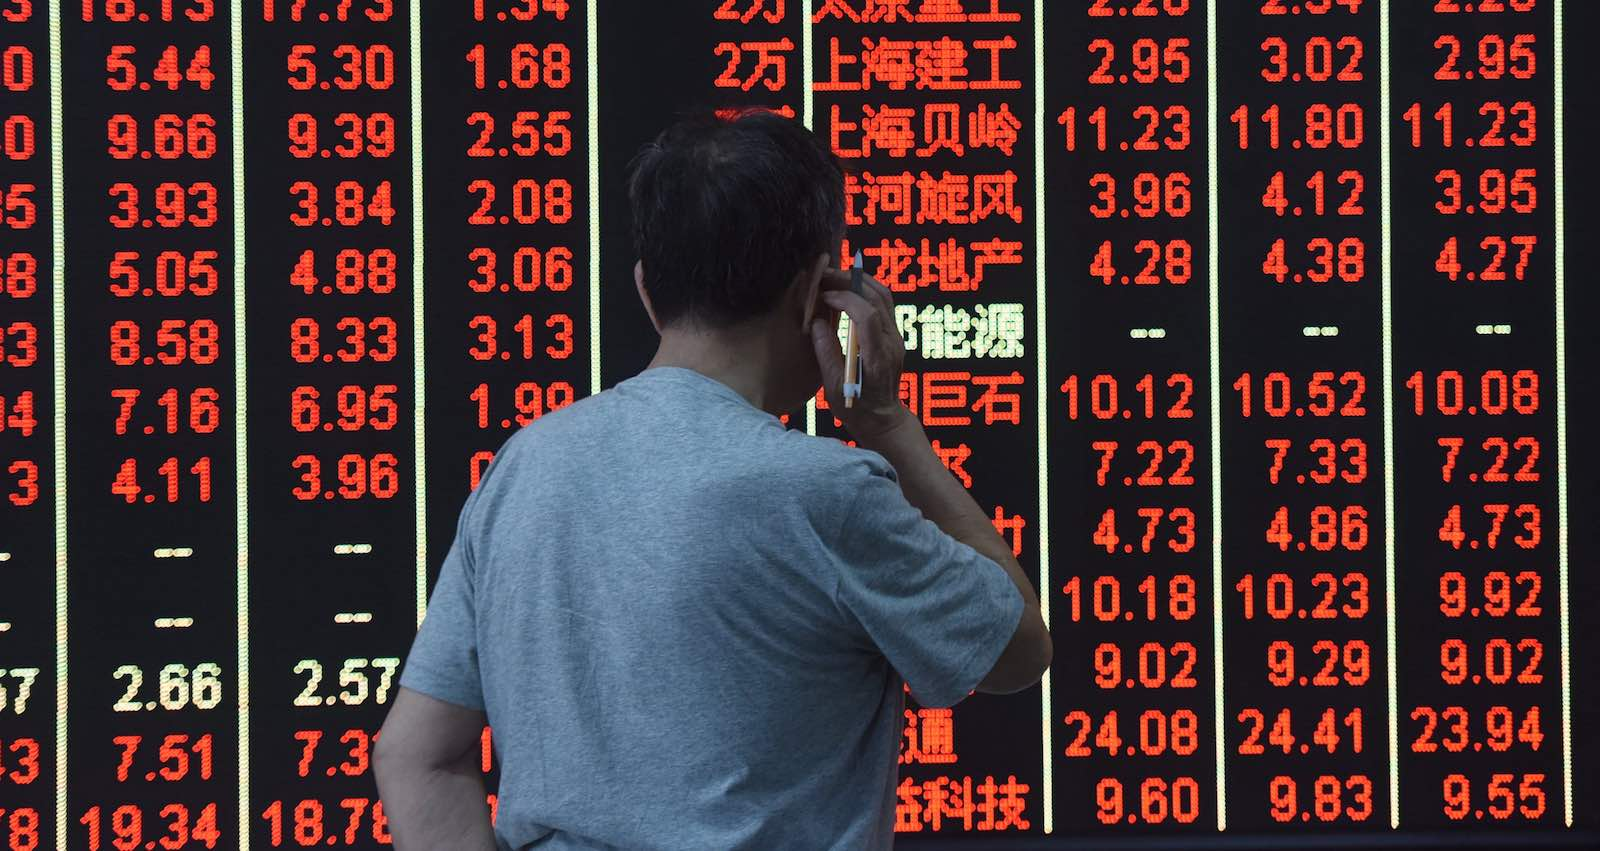 The market exchange hall in Hangzhou, China (Photo: VCG via Getty)